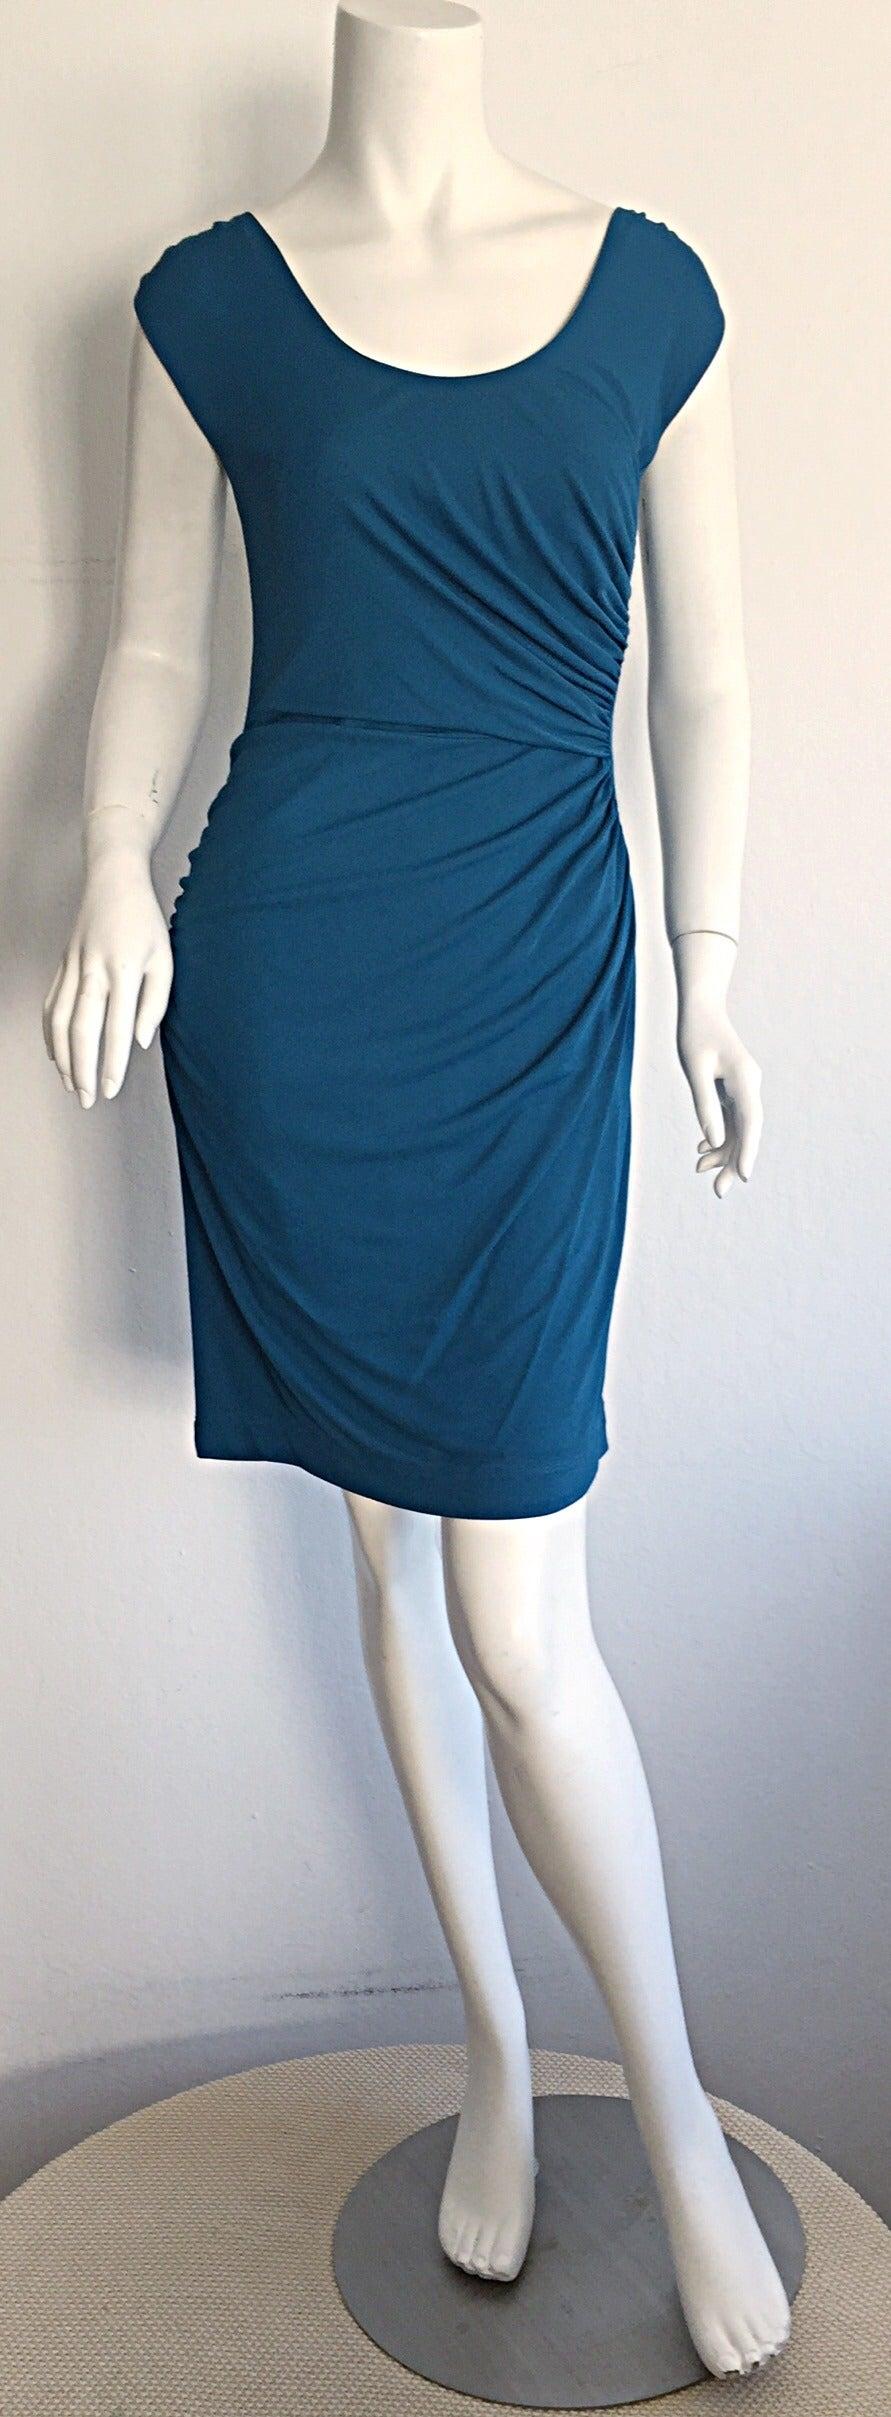 1990s Alberta Ferretti Size 6 / 8 Vintage Blue Jersey Draped Grecian Dress For Sale 4